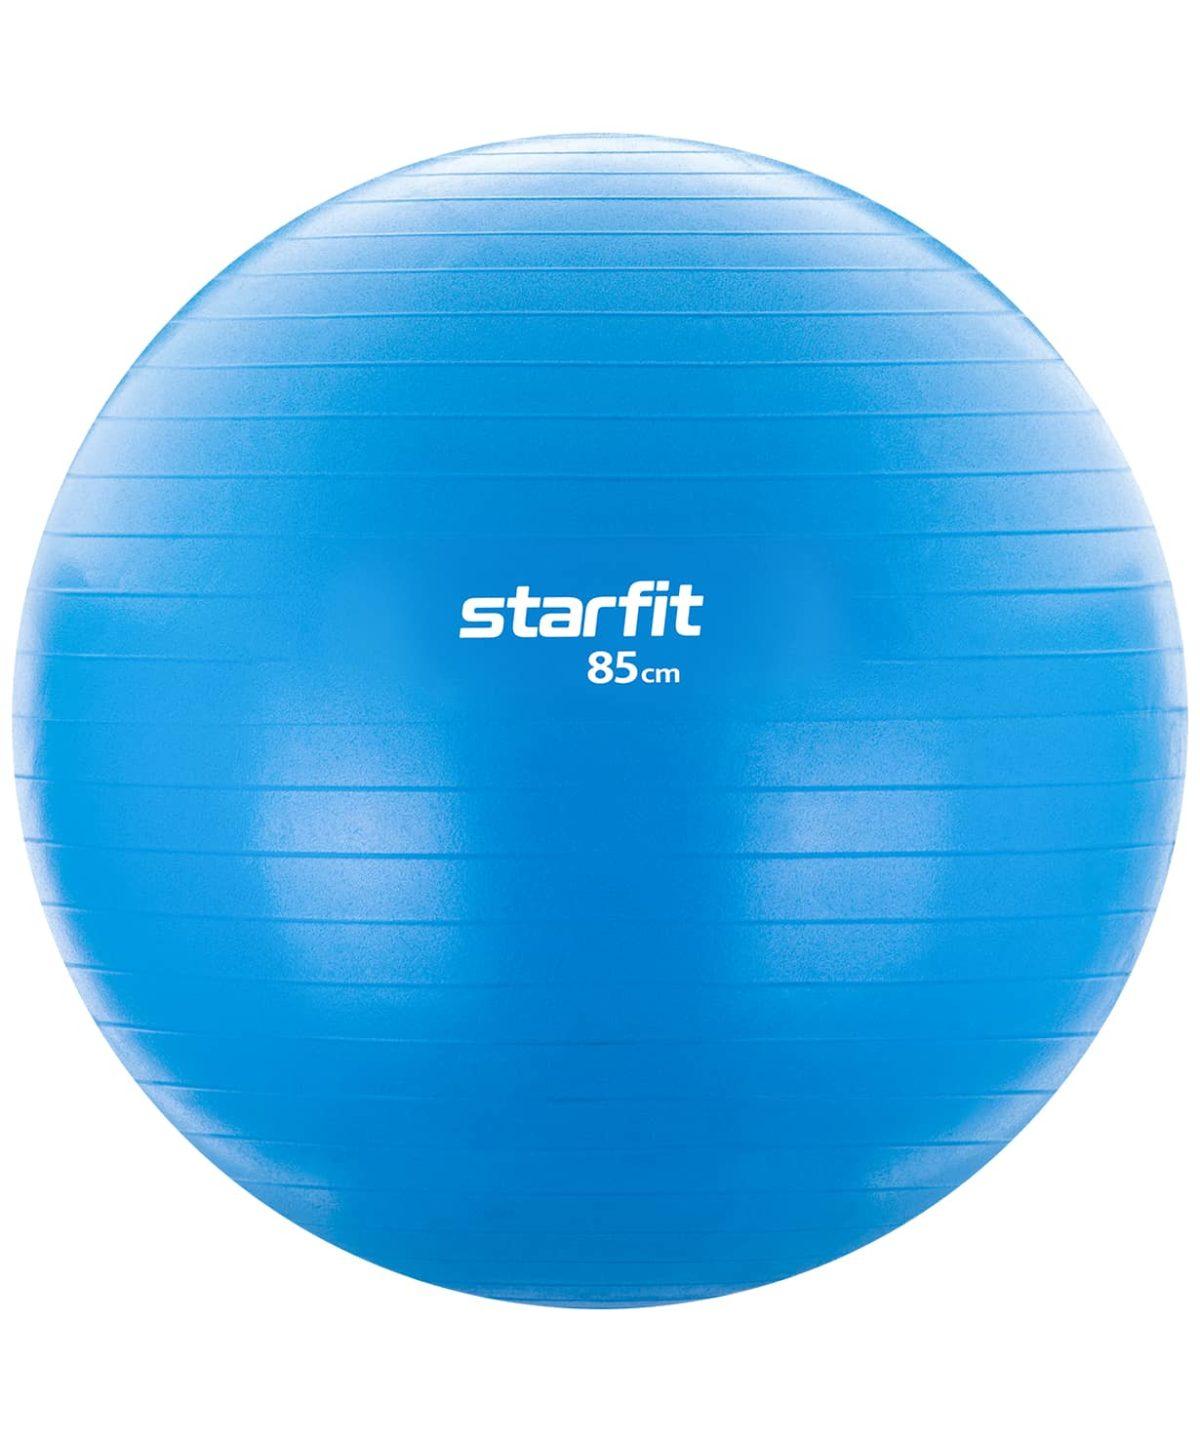 STARFIT Фитбол антивзрыв 85 см 1500 гр, без насоса GB-104: голубой - 1